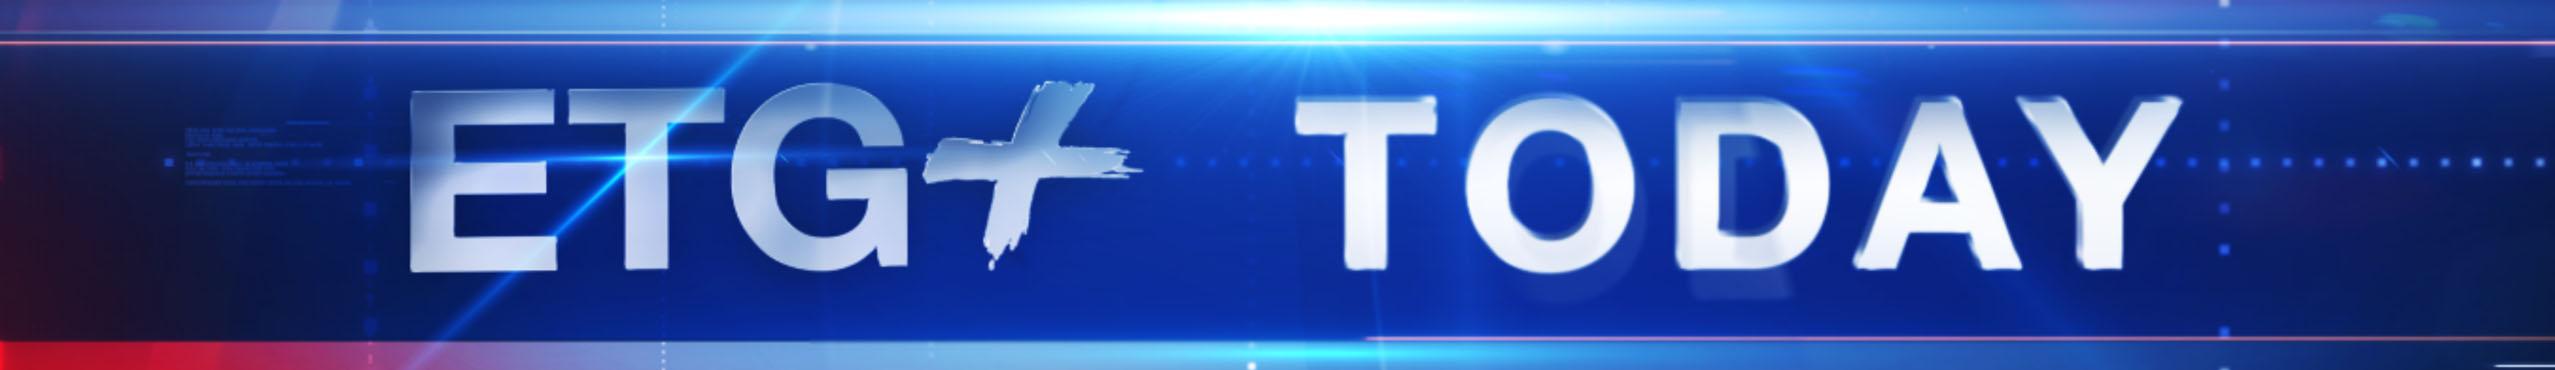 banner ETG+ Today